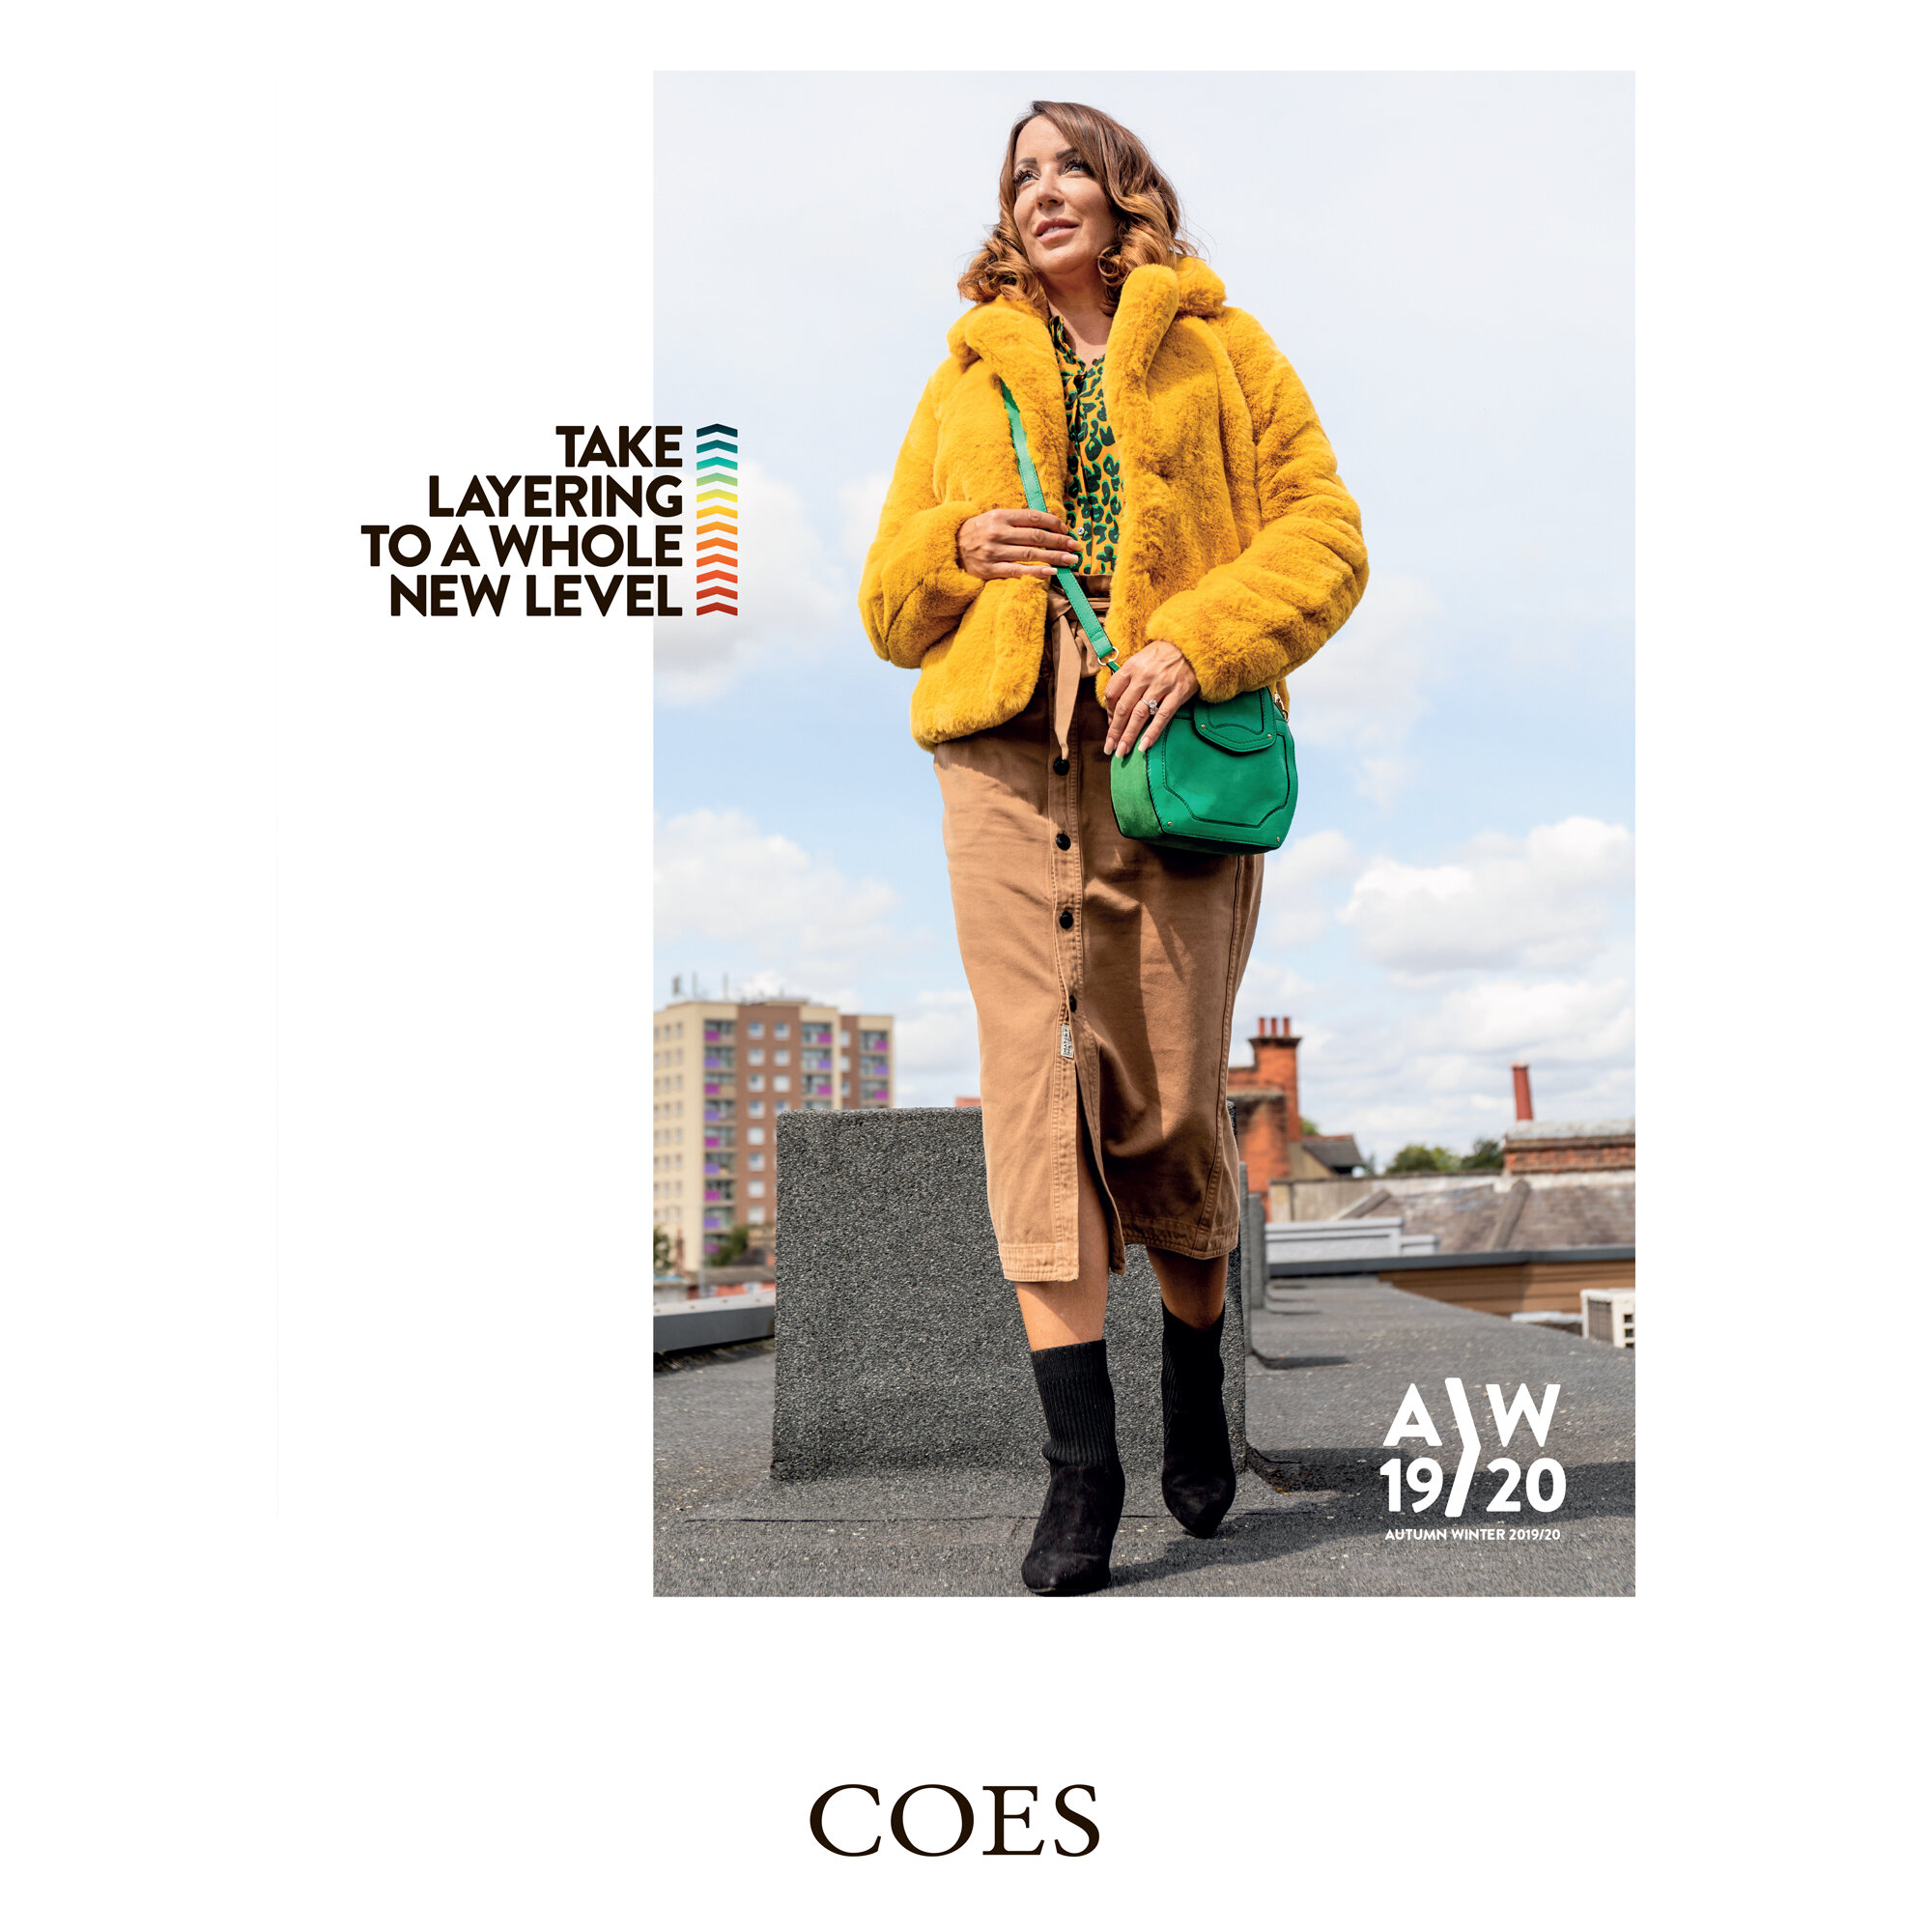 Coes_layering_poster1.jpg